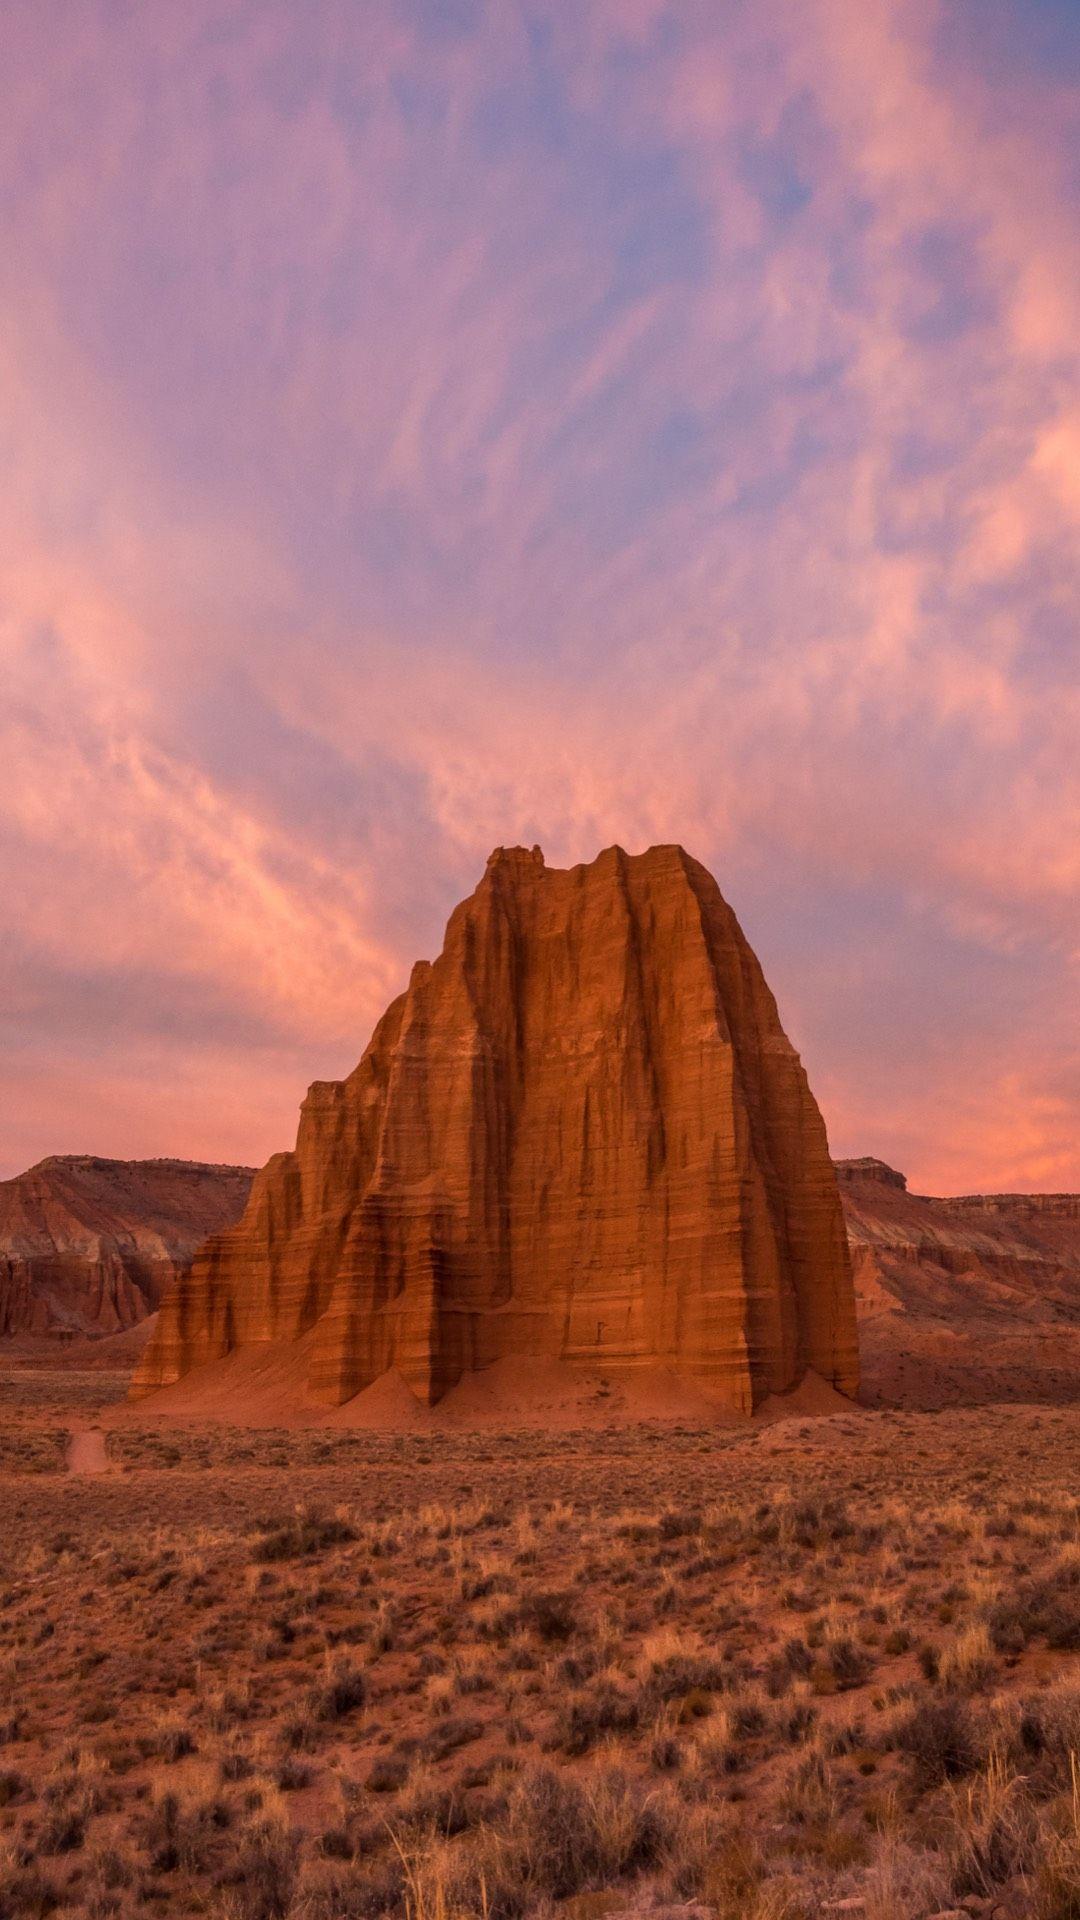 10 Desert Phone Wallpapers in 2020